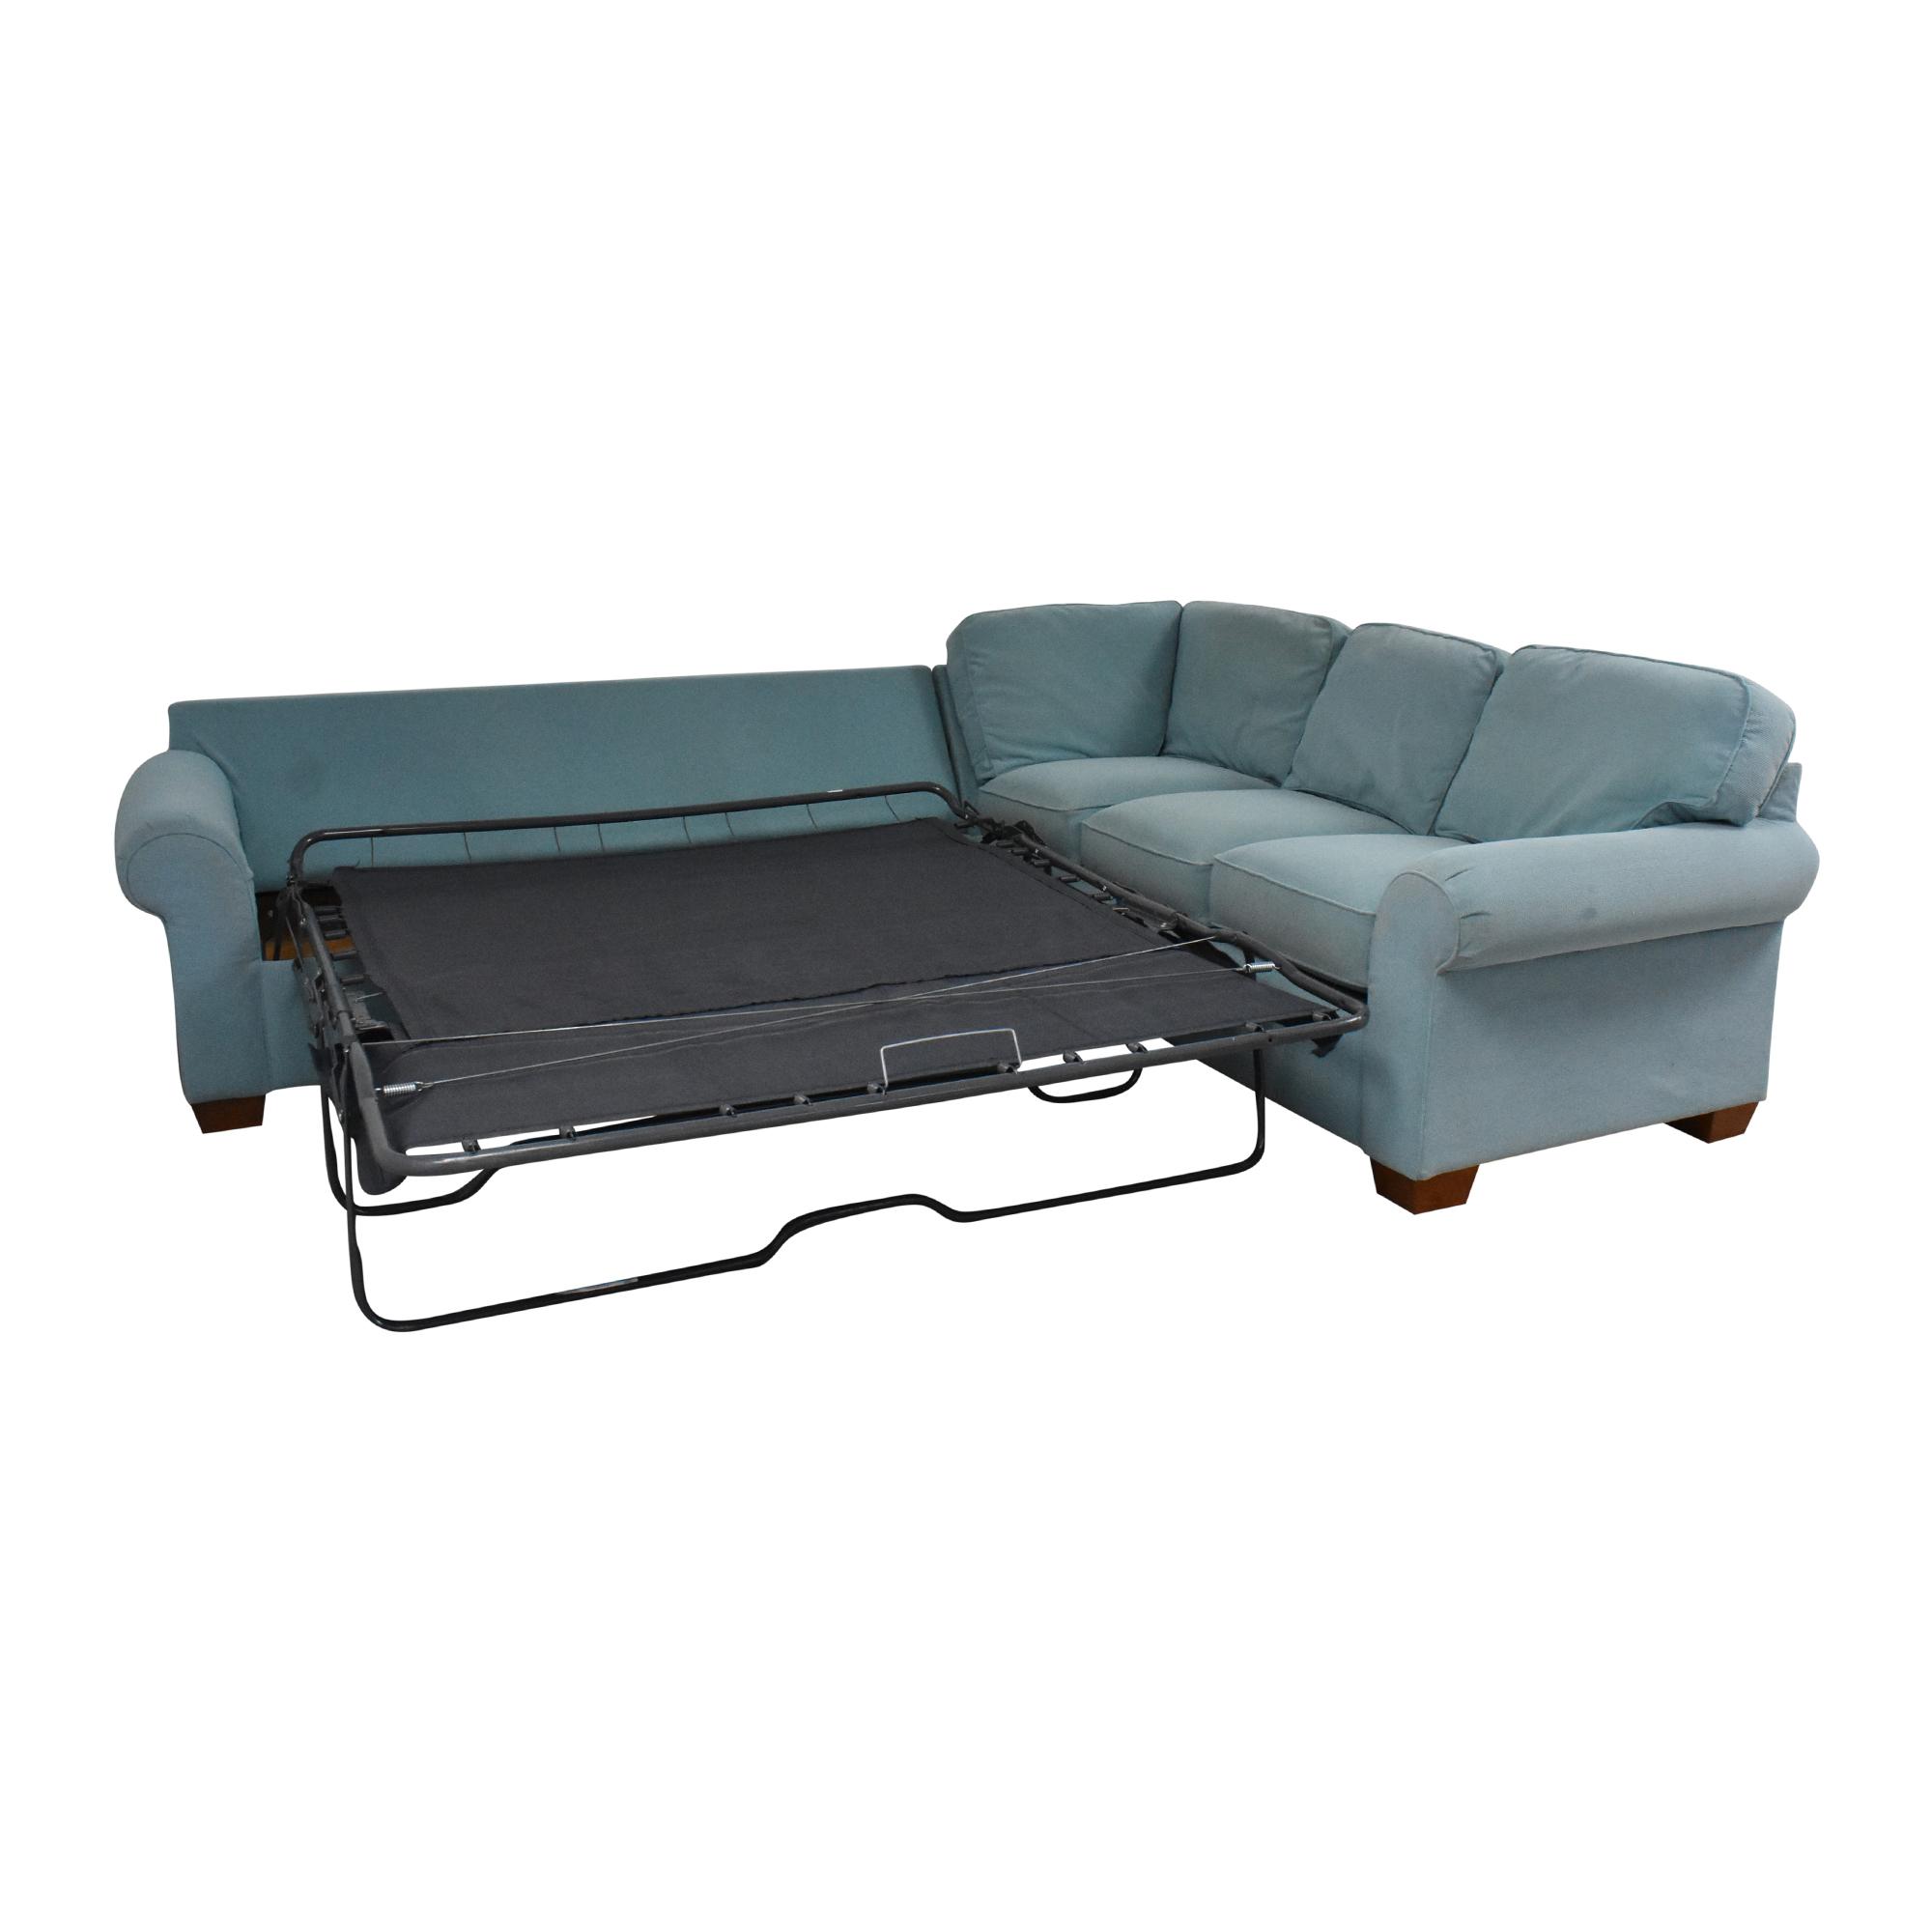 La-Z-Boy La-Z-Boy Corner Sectional Sleeper Sofa nj